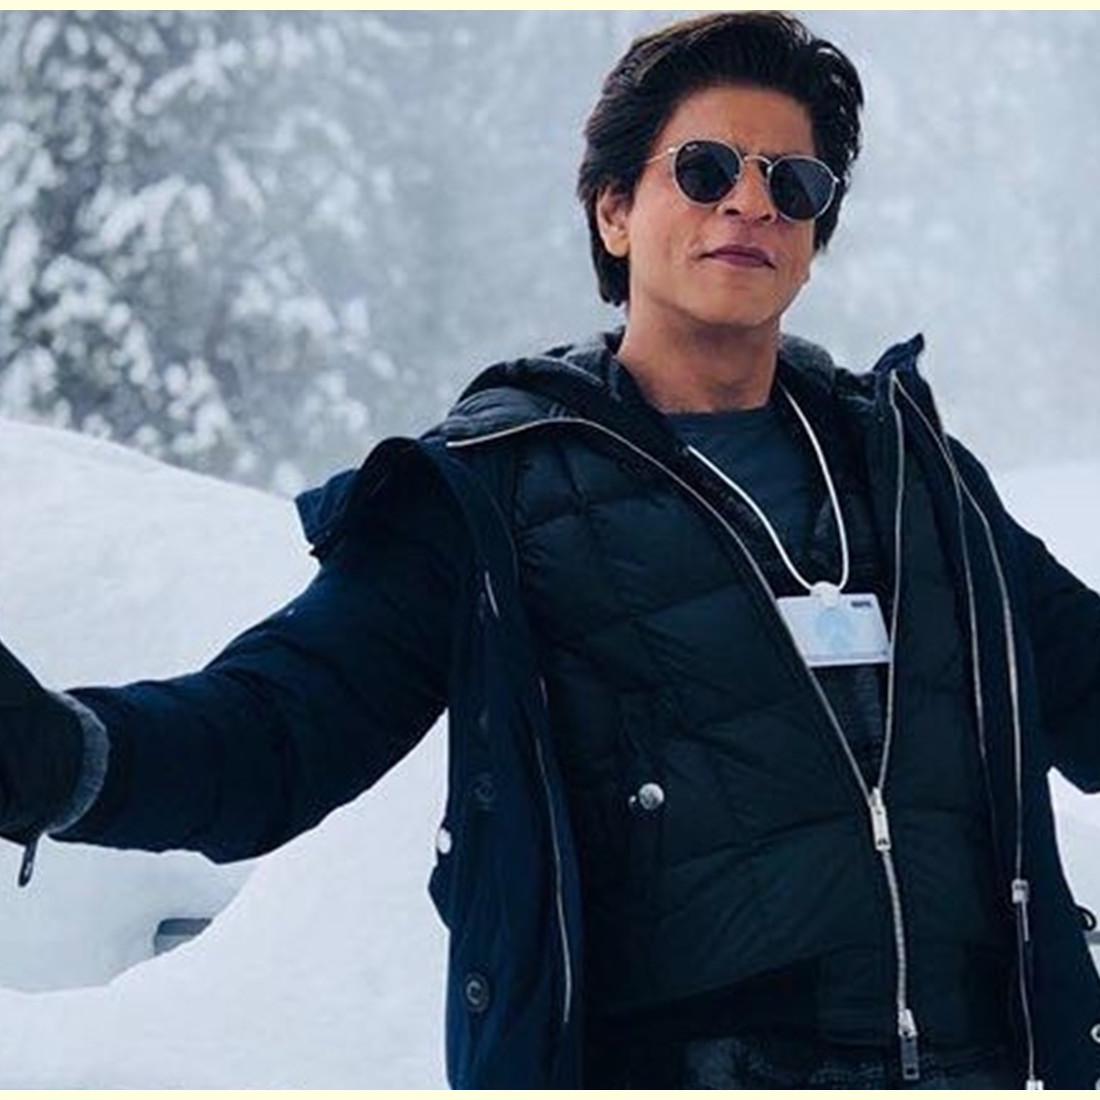 Tarif endorsement Shah Rukh Khan fantastis, sekali posting Rp 2 miliar